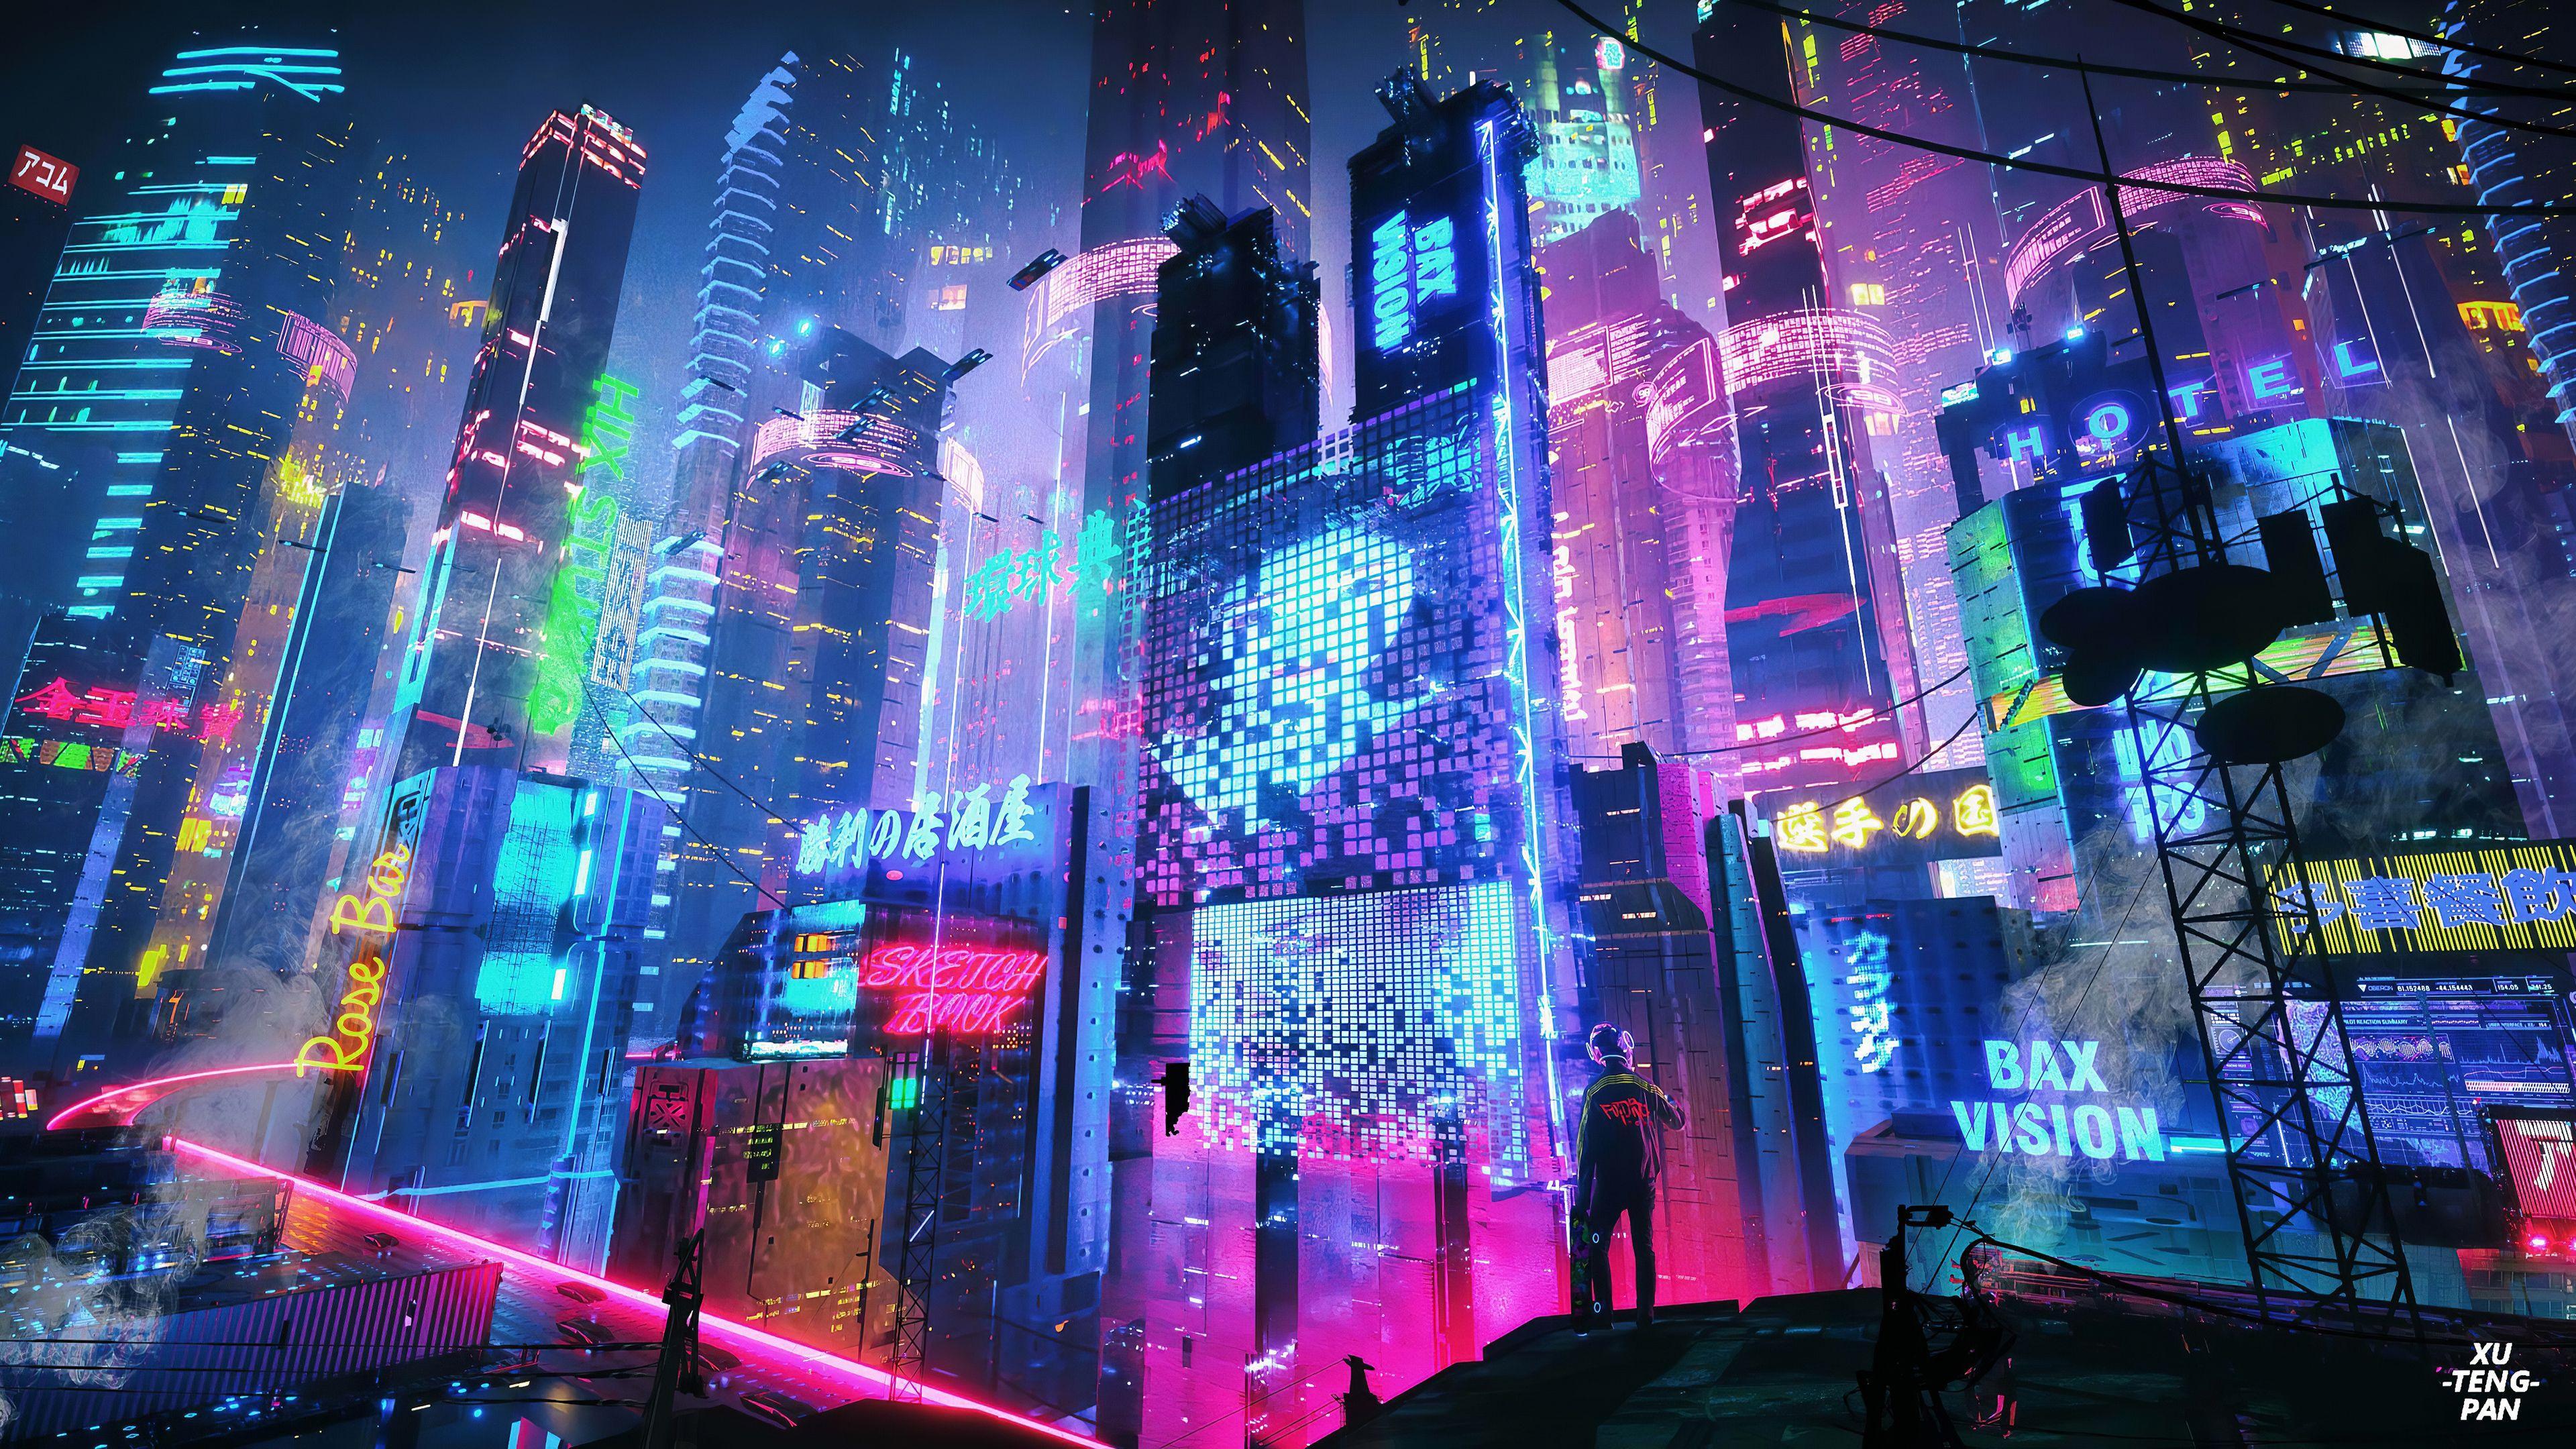 Neon City Cyberpunk Wallpapers - Top Free Neon City ...